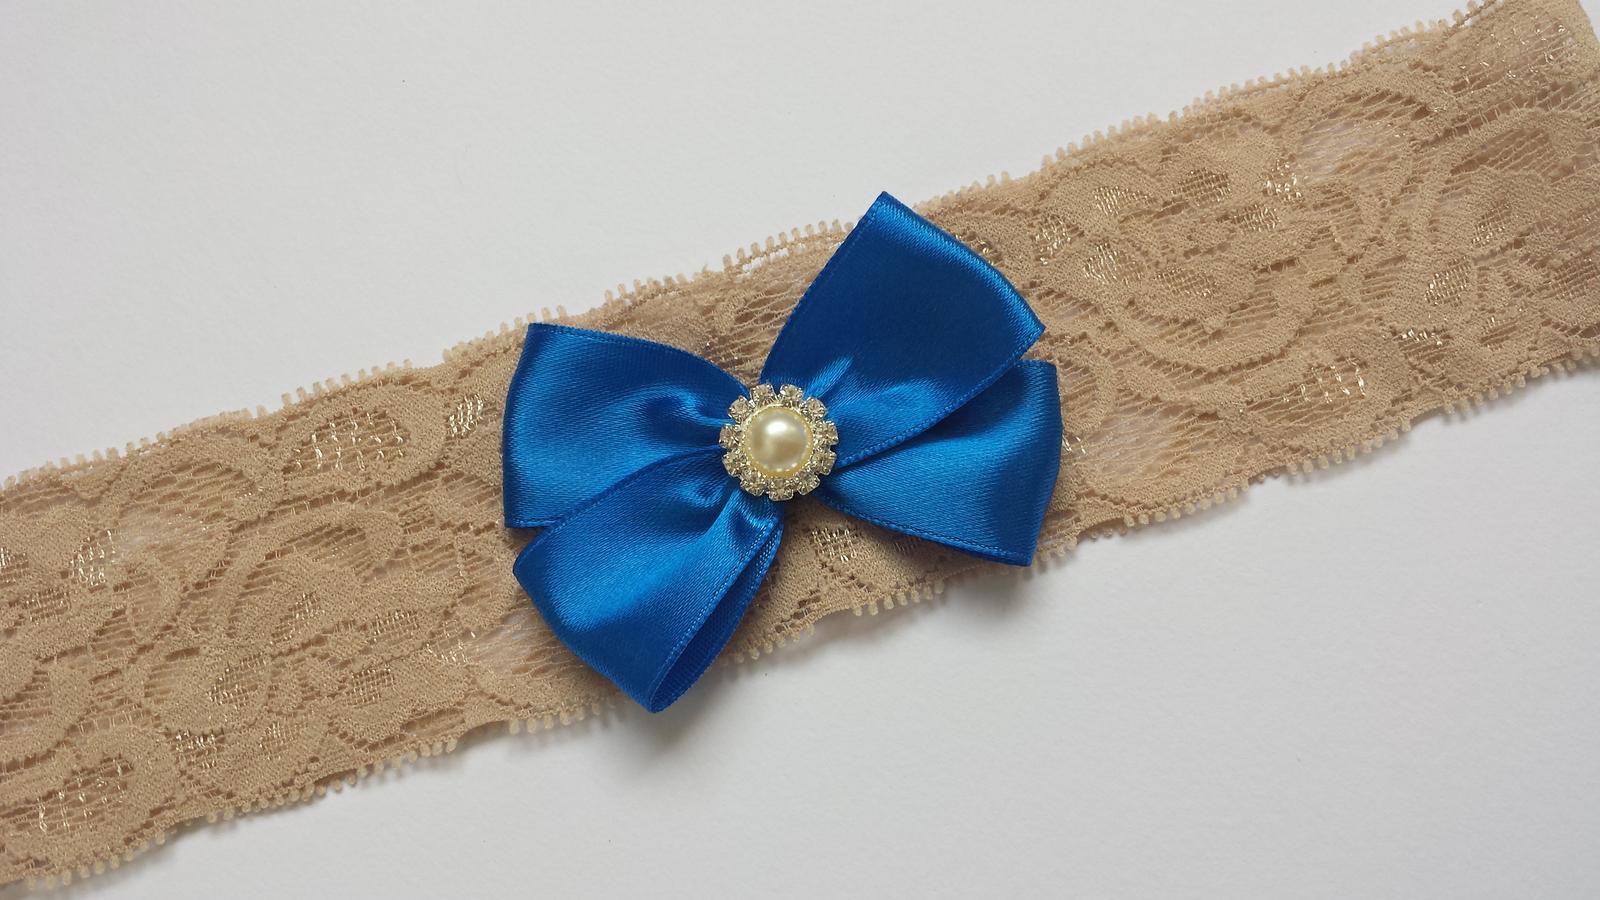 Krajkový béžový podvazek s tm.modrou mašličkou - Obrázek č. 1